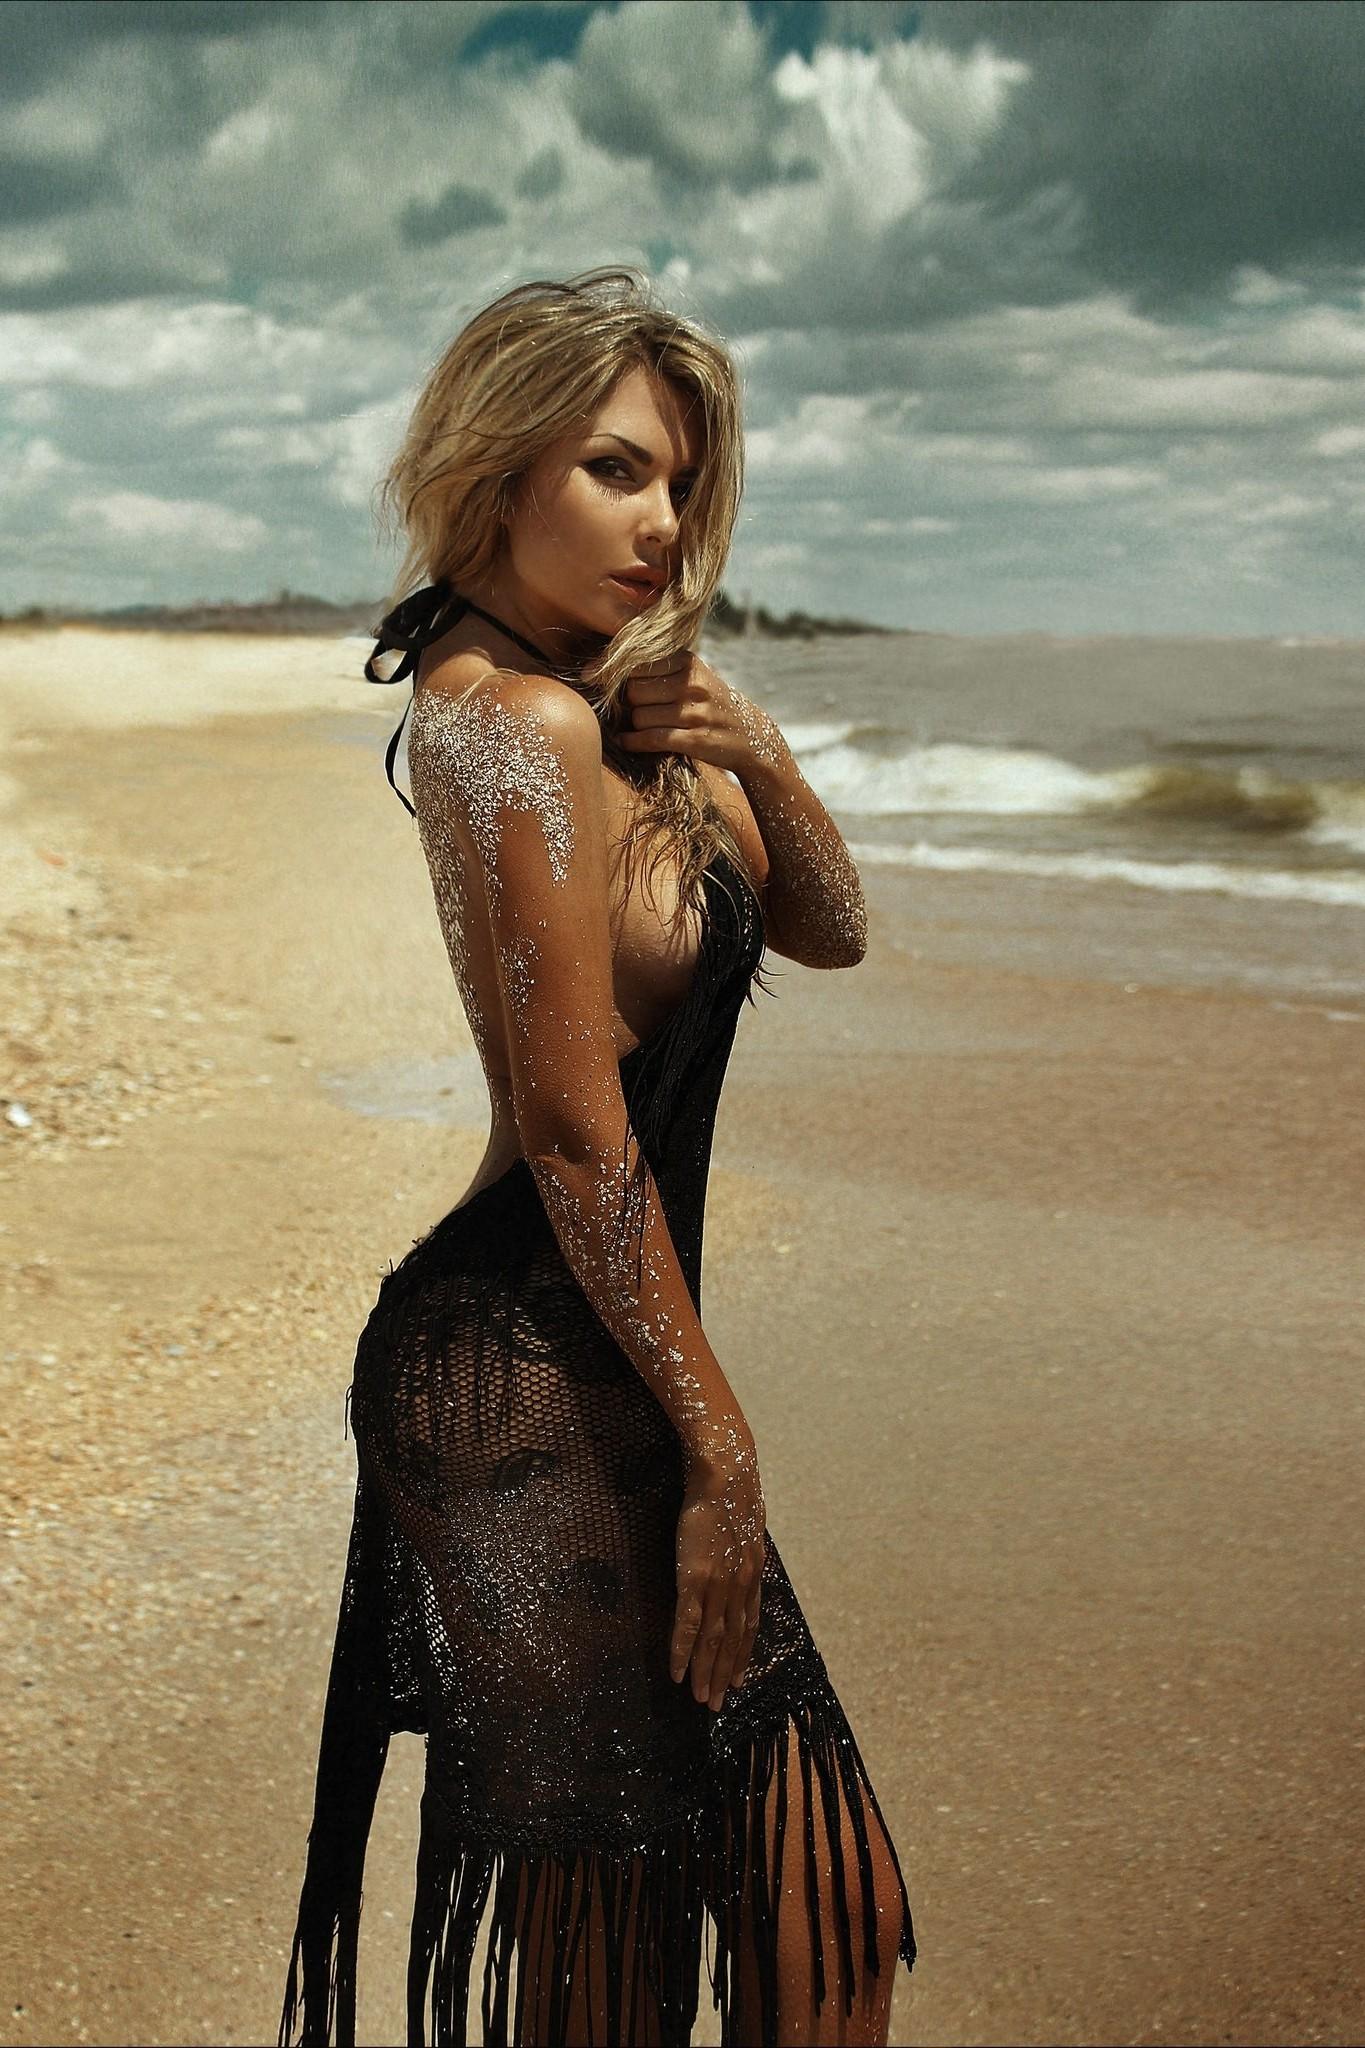 beach girl blonde sand sexy model clouds